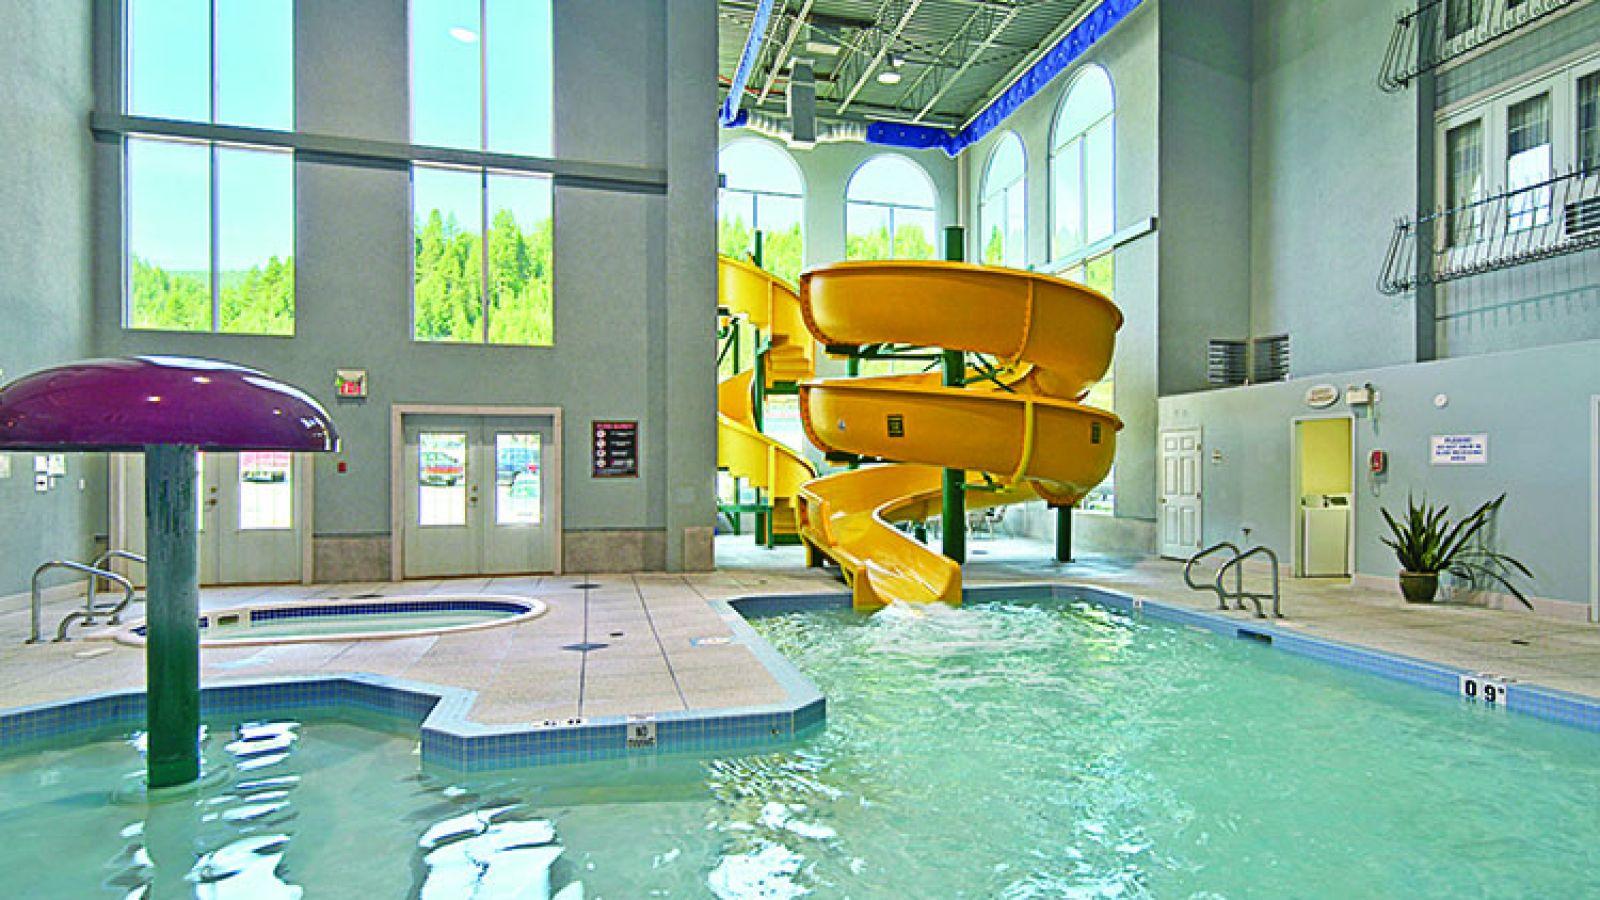 Enjoy the indoor pool and waterside.